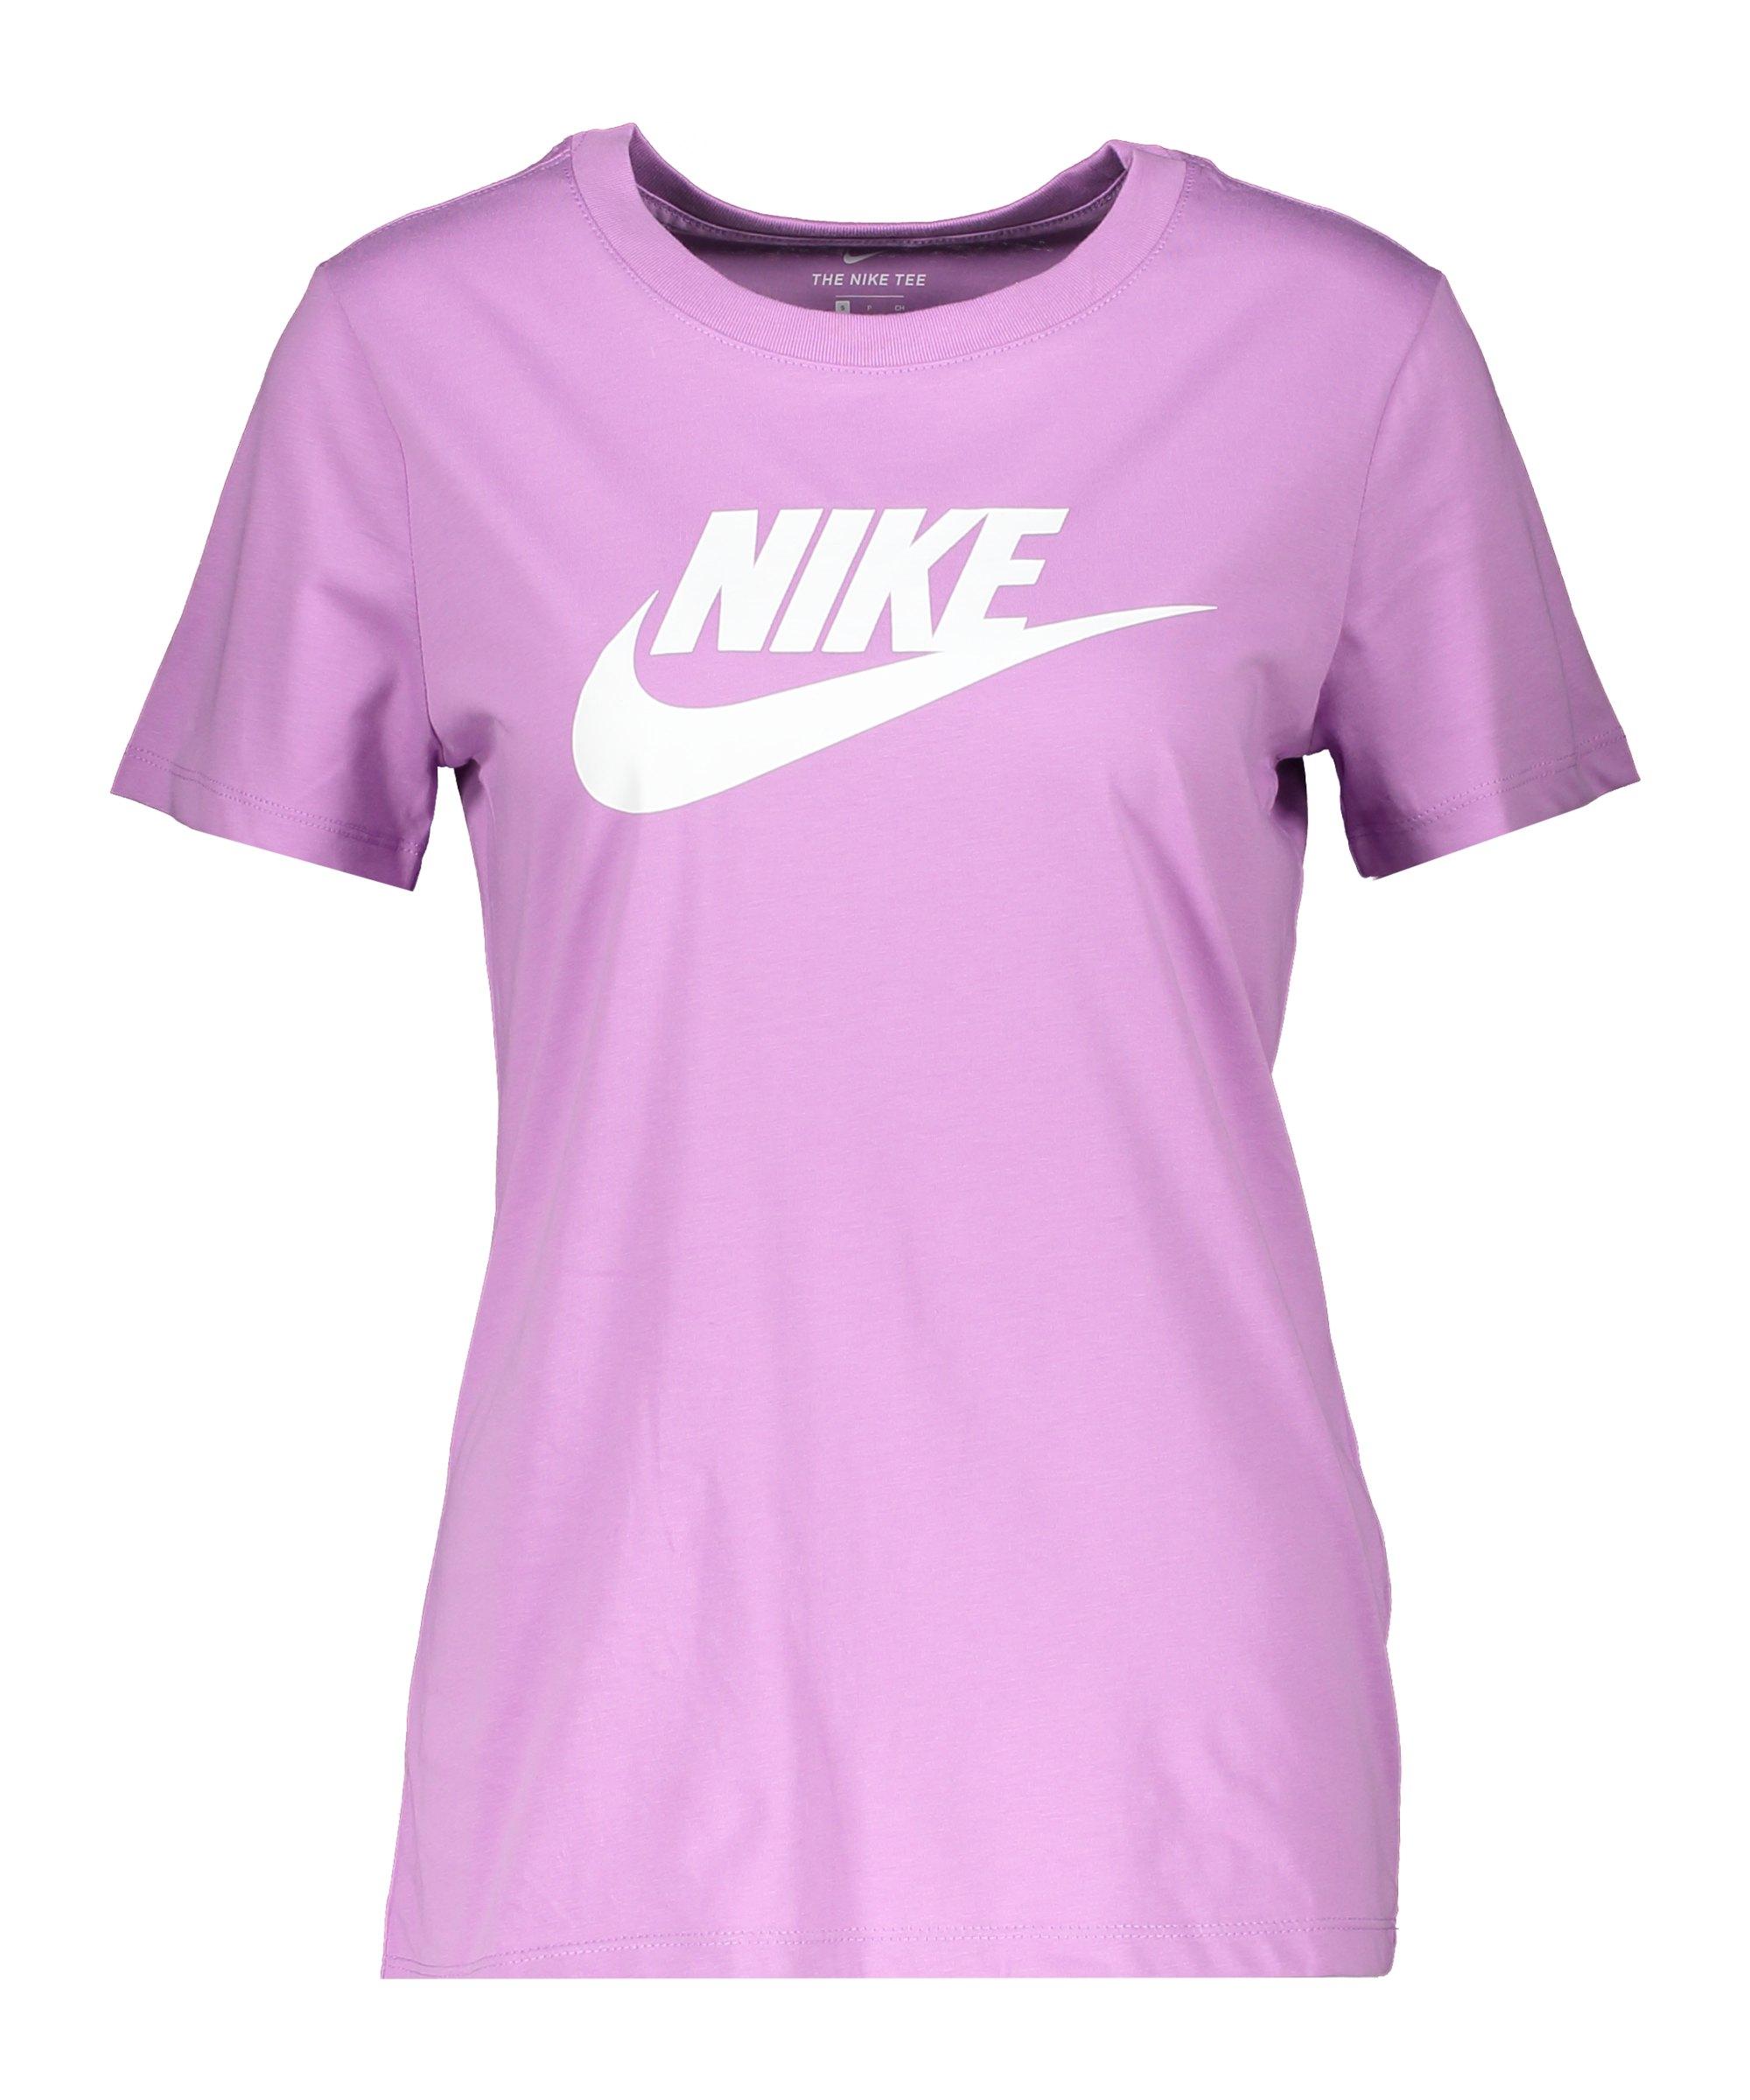 Nike Essential T-Shirt Damen Lila Weiss F591 - lila